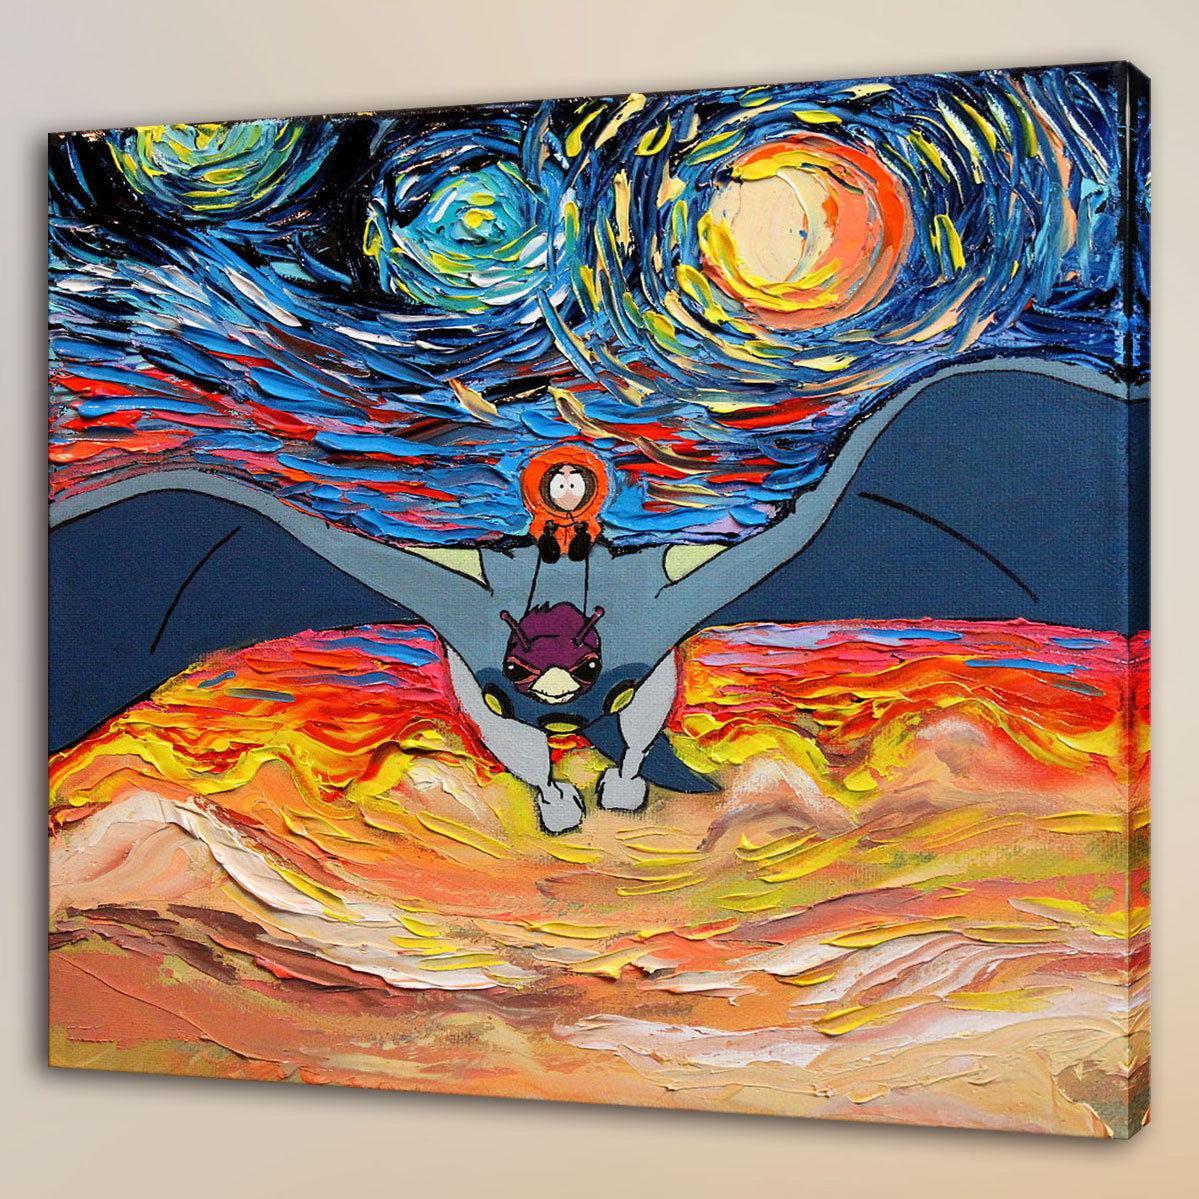 Satın Al Van Gogh Peynir 1 Adet Shome Dekor Hd Baskılı Modern Sanat